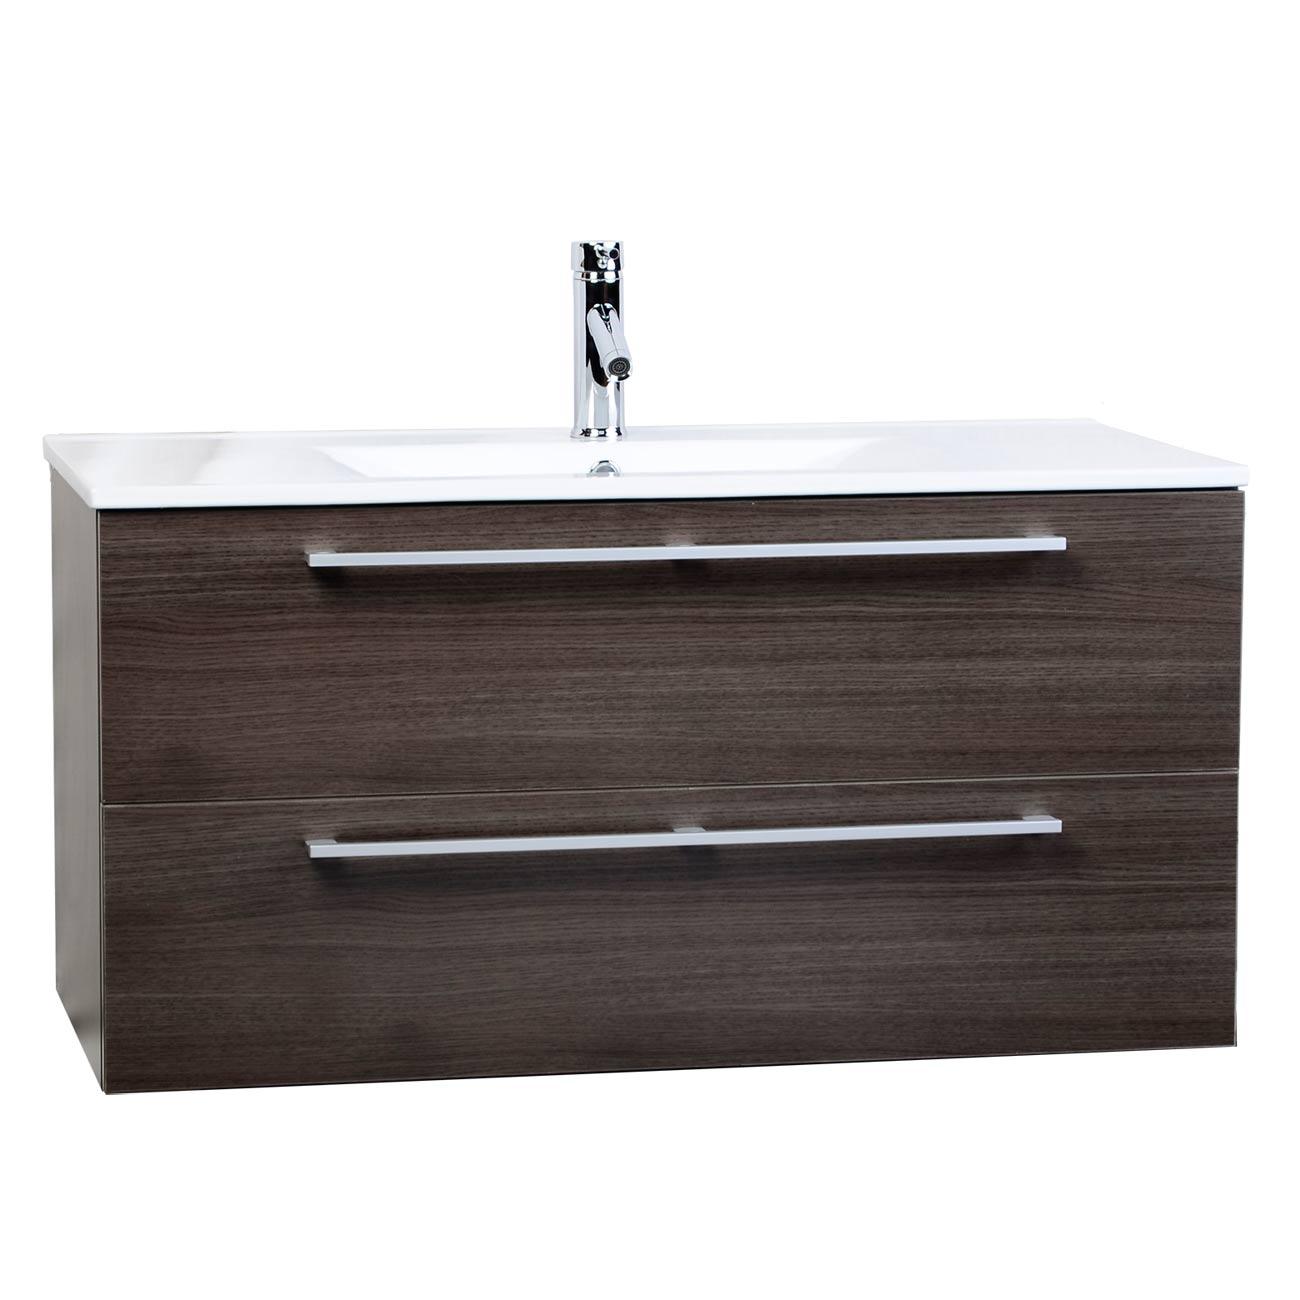 Caen 40 Wall Mount Modern Bathroom Vanity Set Grey Oak Optional Mirror Rs Dm1000 Go